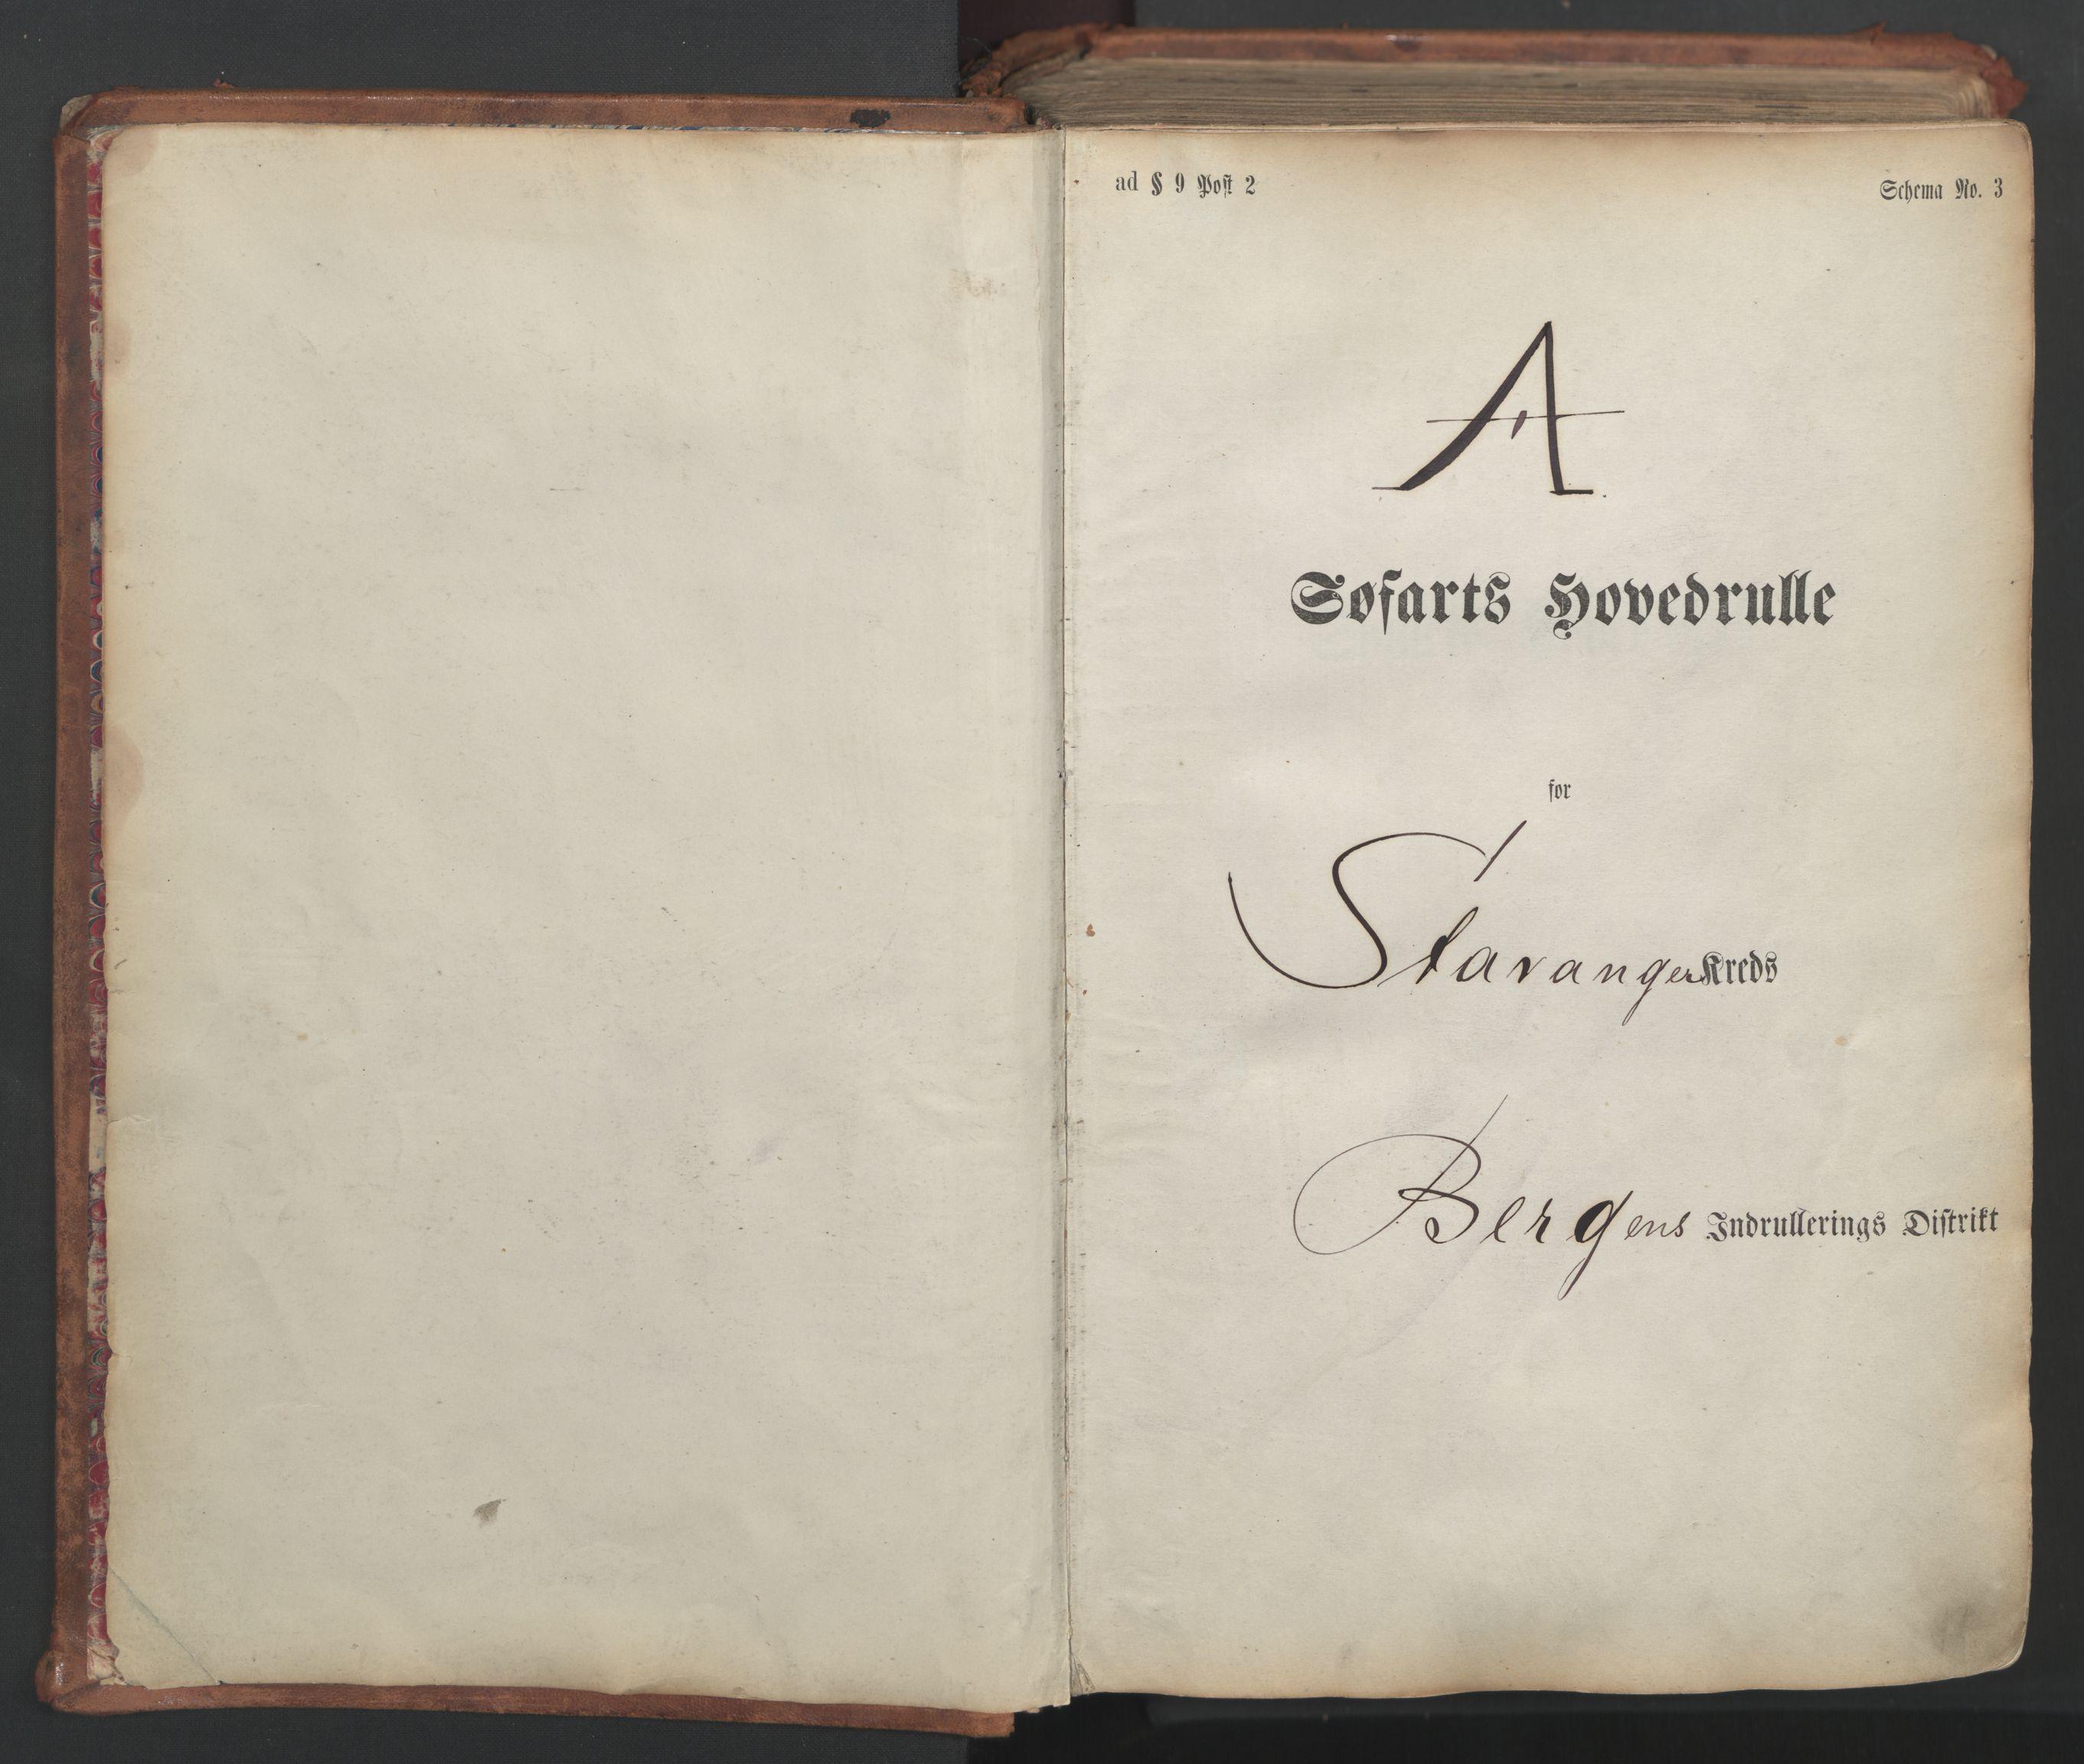 SAST, Stavanger sjømannskontor, F/Fb/Fbb/L0007: Sjøfartshovedrulle, patentnr. 2403-3604, 1869-1880, s. 3